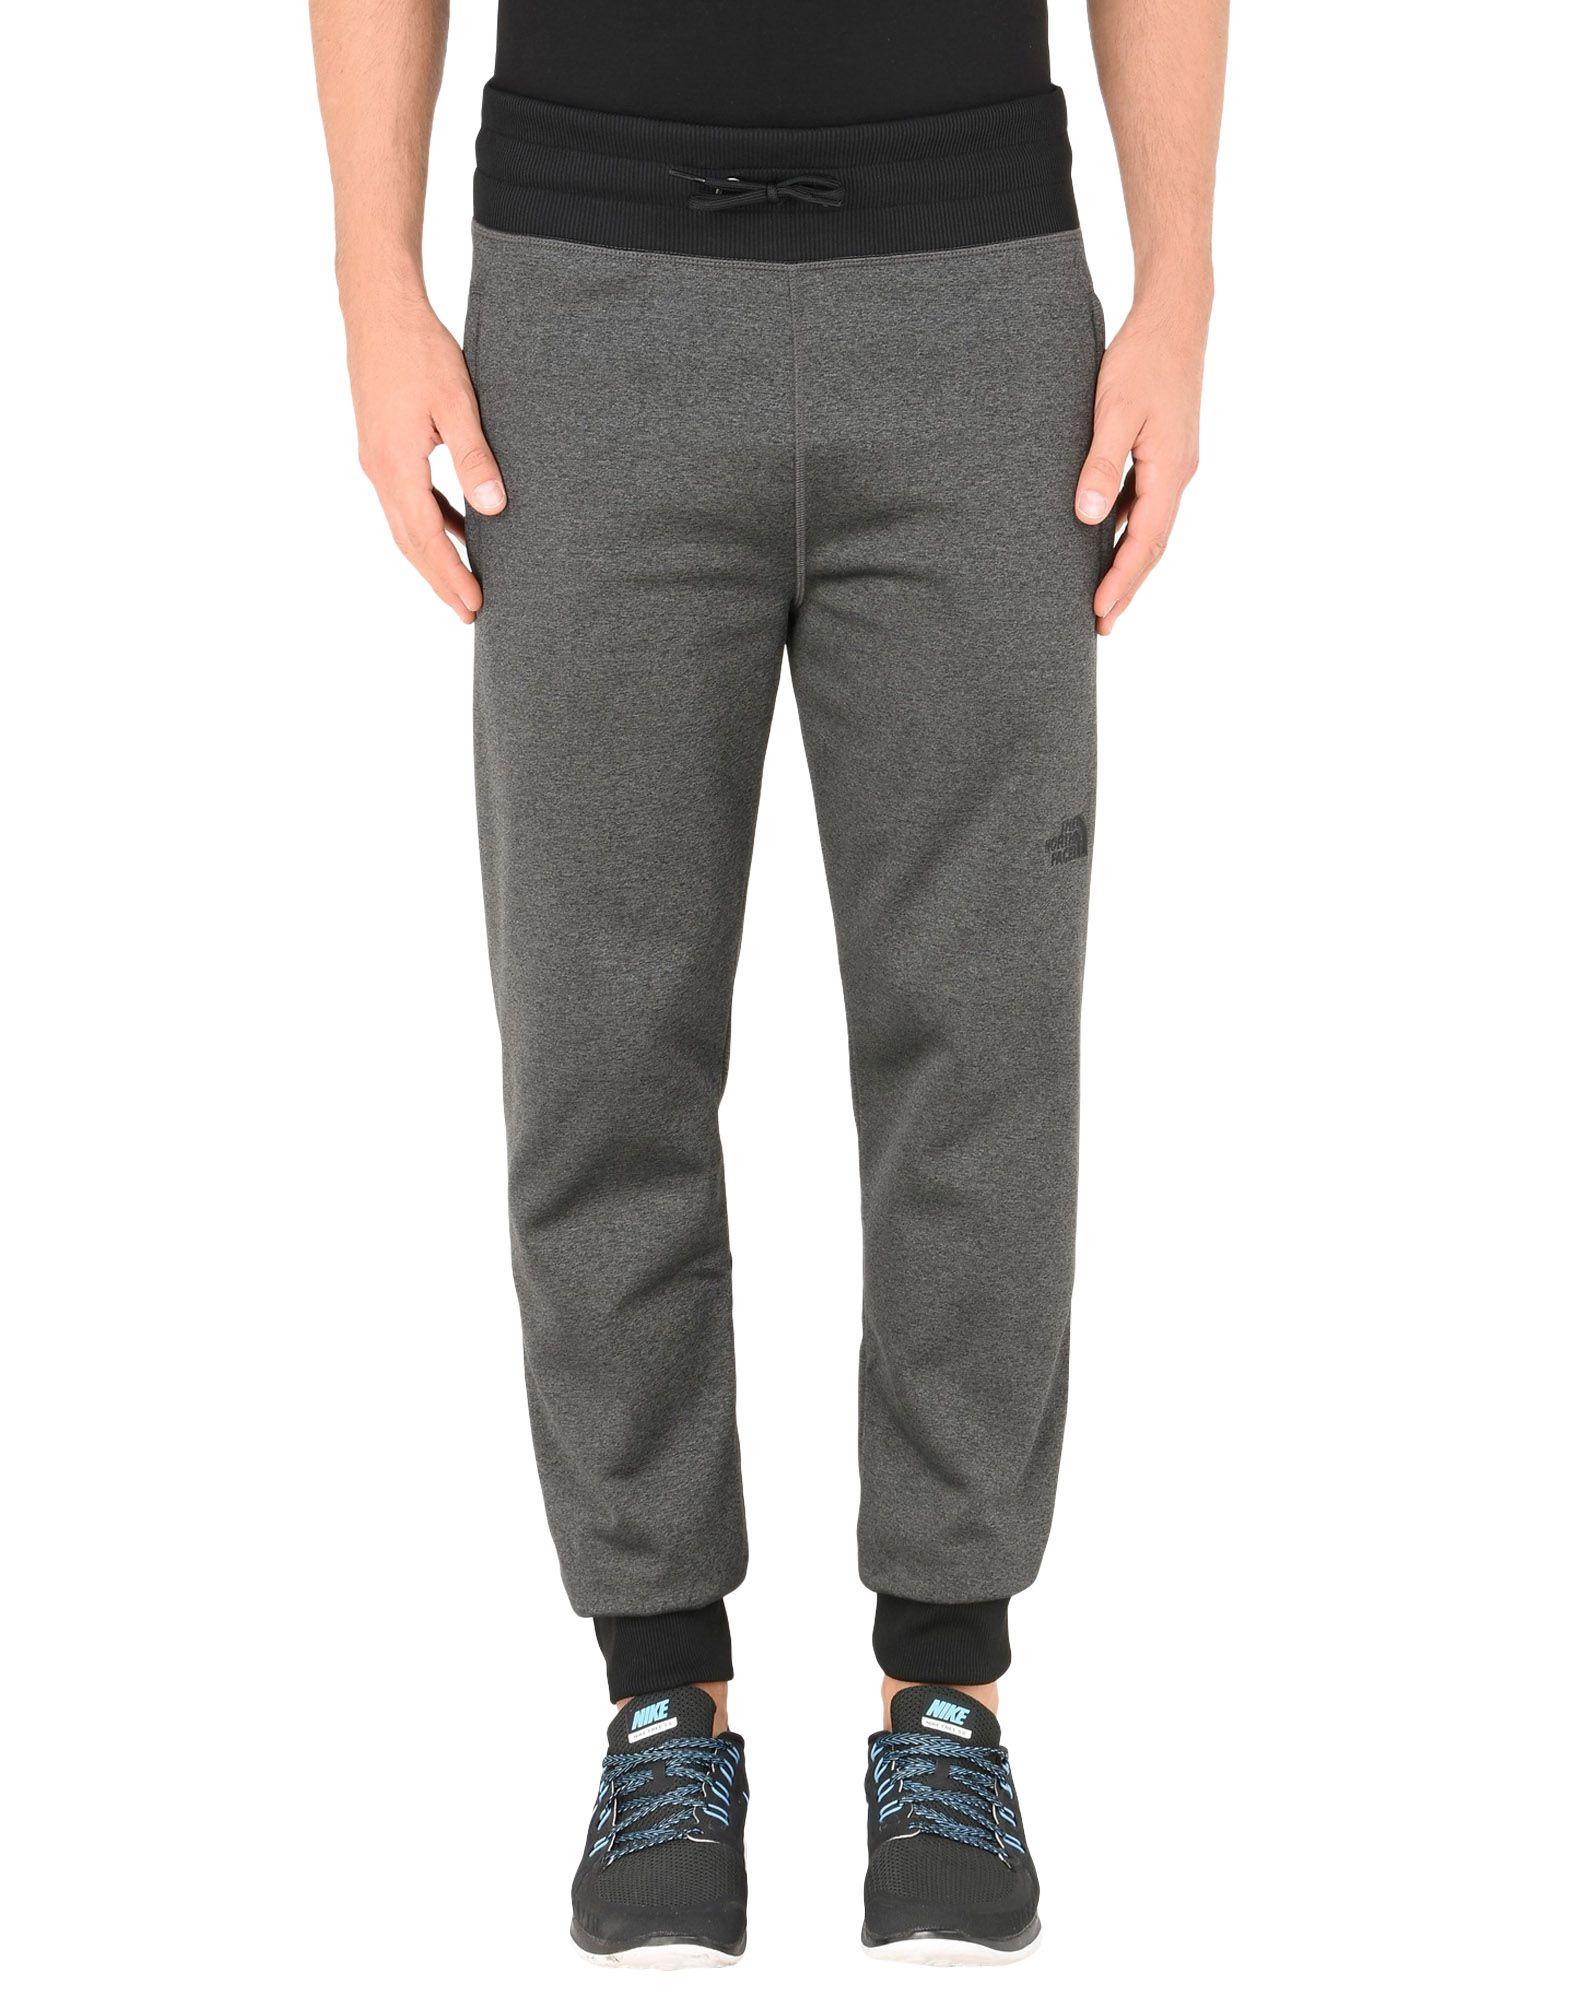 Pantalone The North Face M  Mc Nse Pant  M Logowear - Uomo - 11341727NT 112a3f